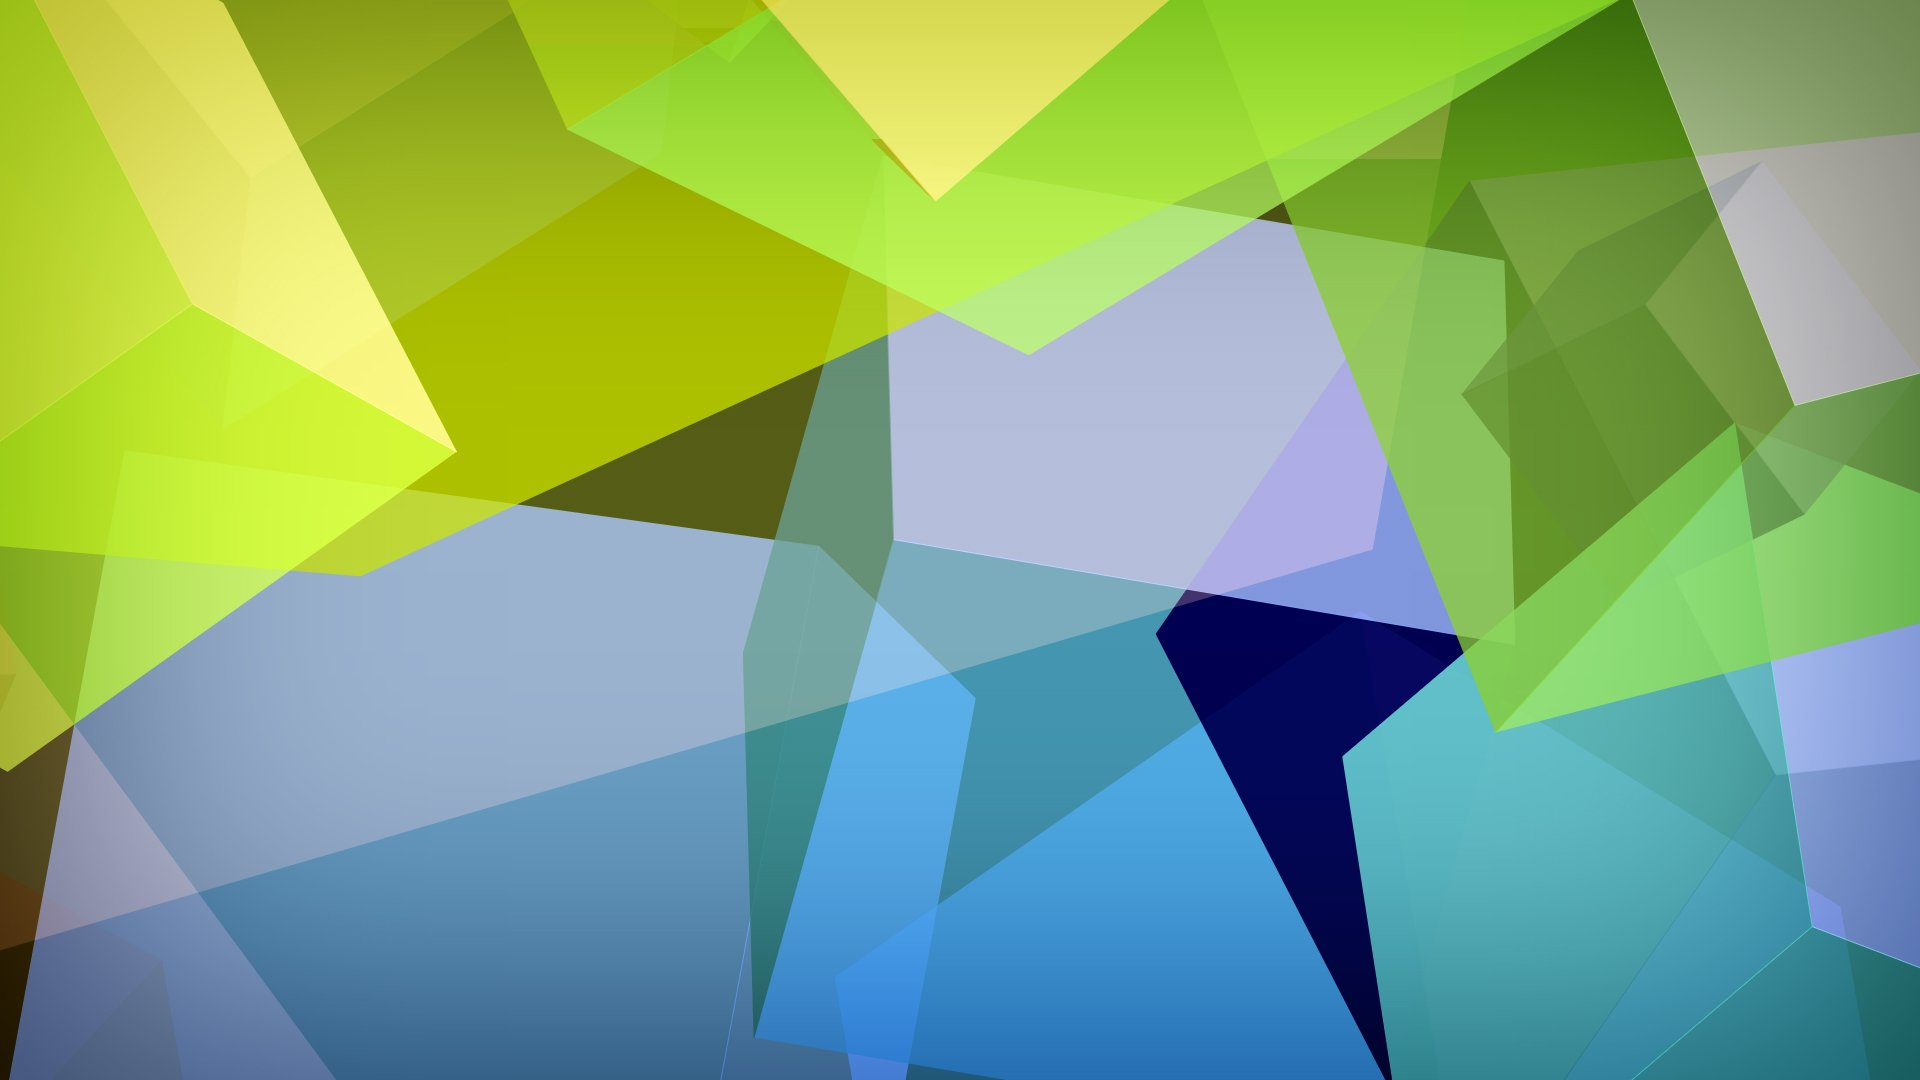 Shapes Desktop Wallpapers Top Free Shapes Desktop